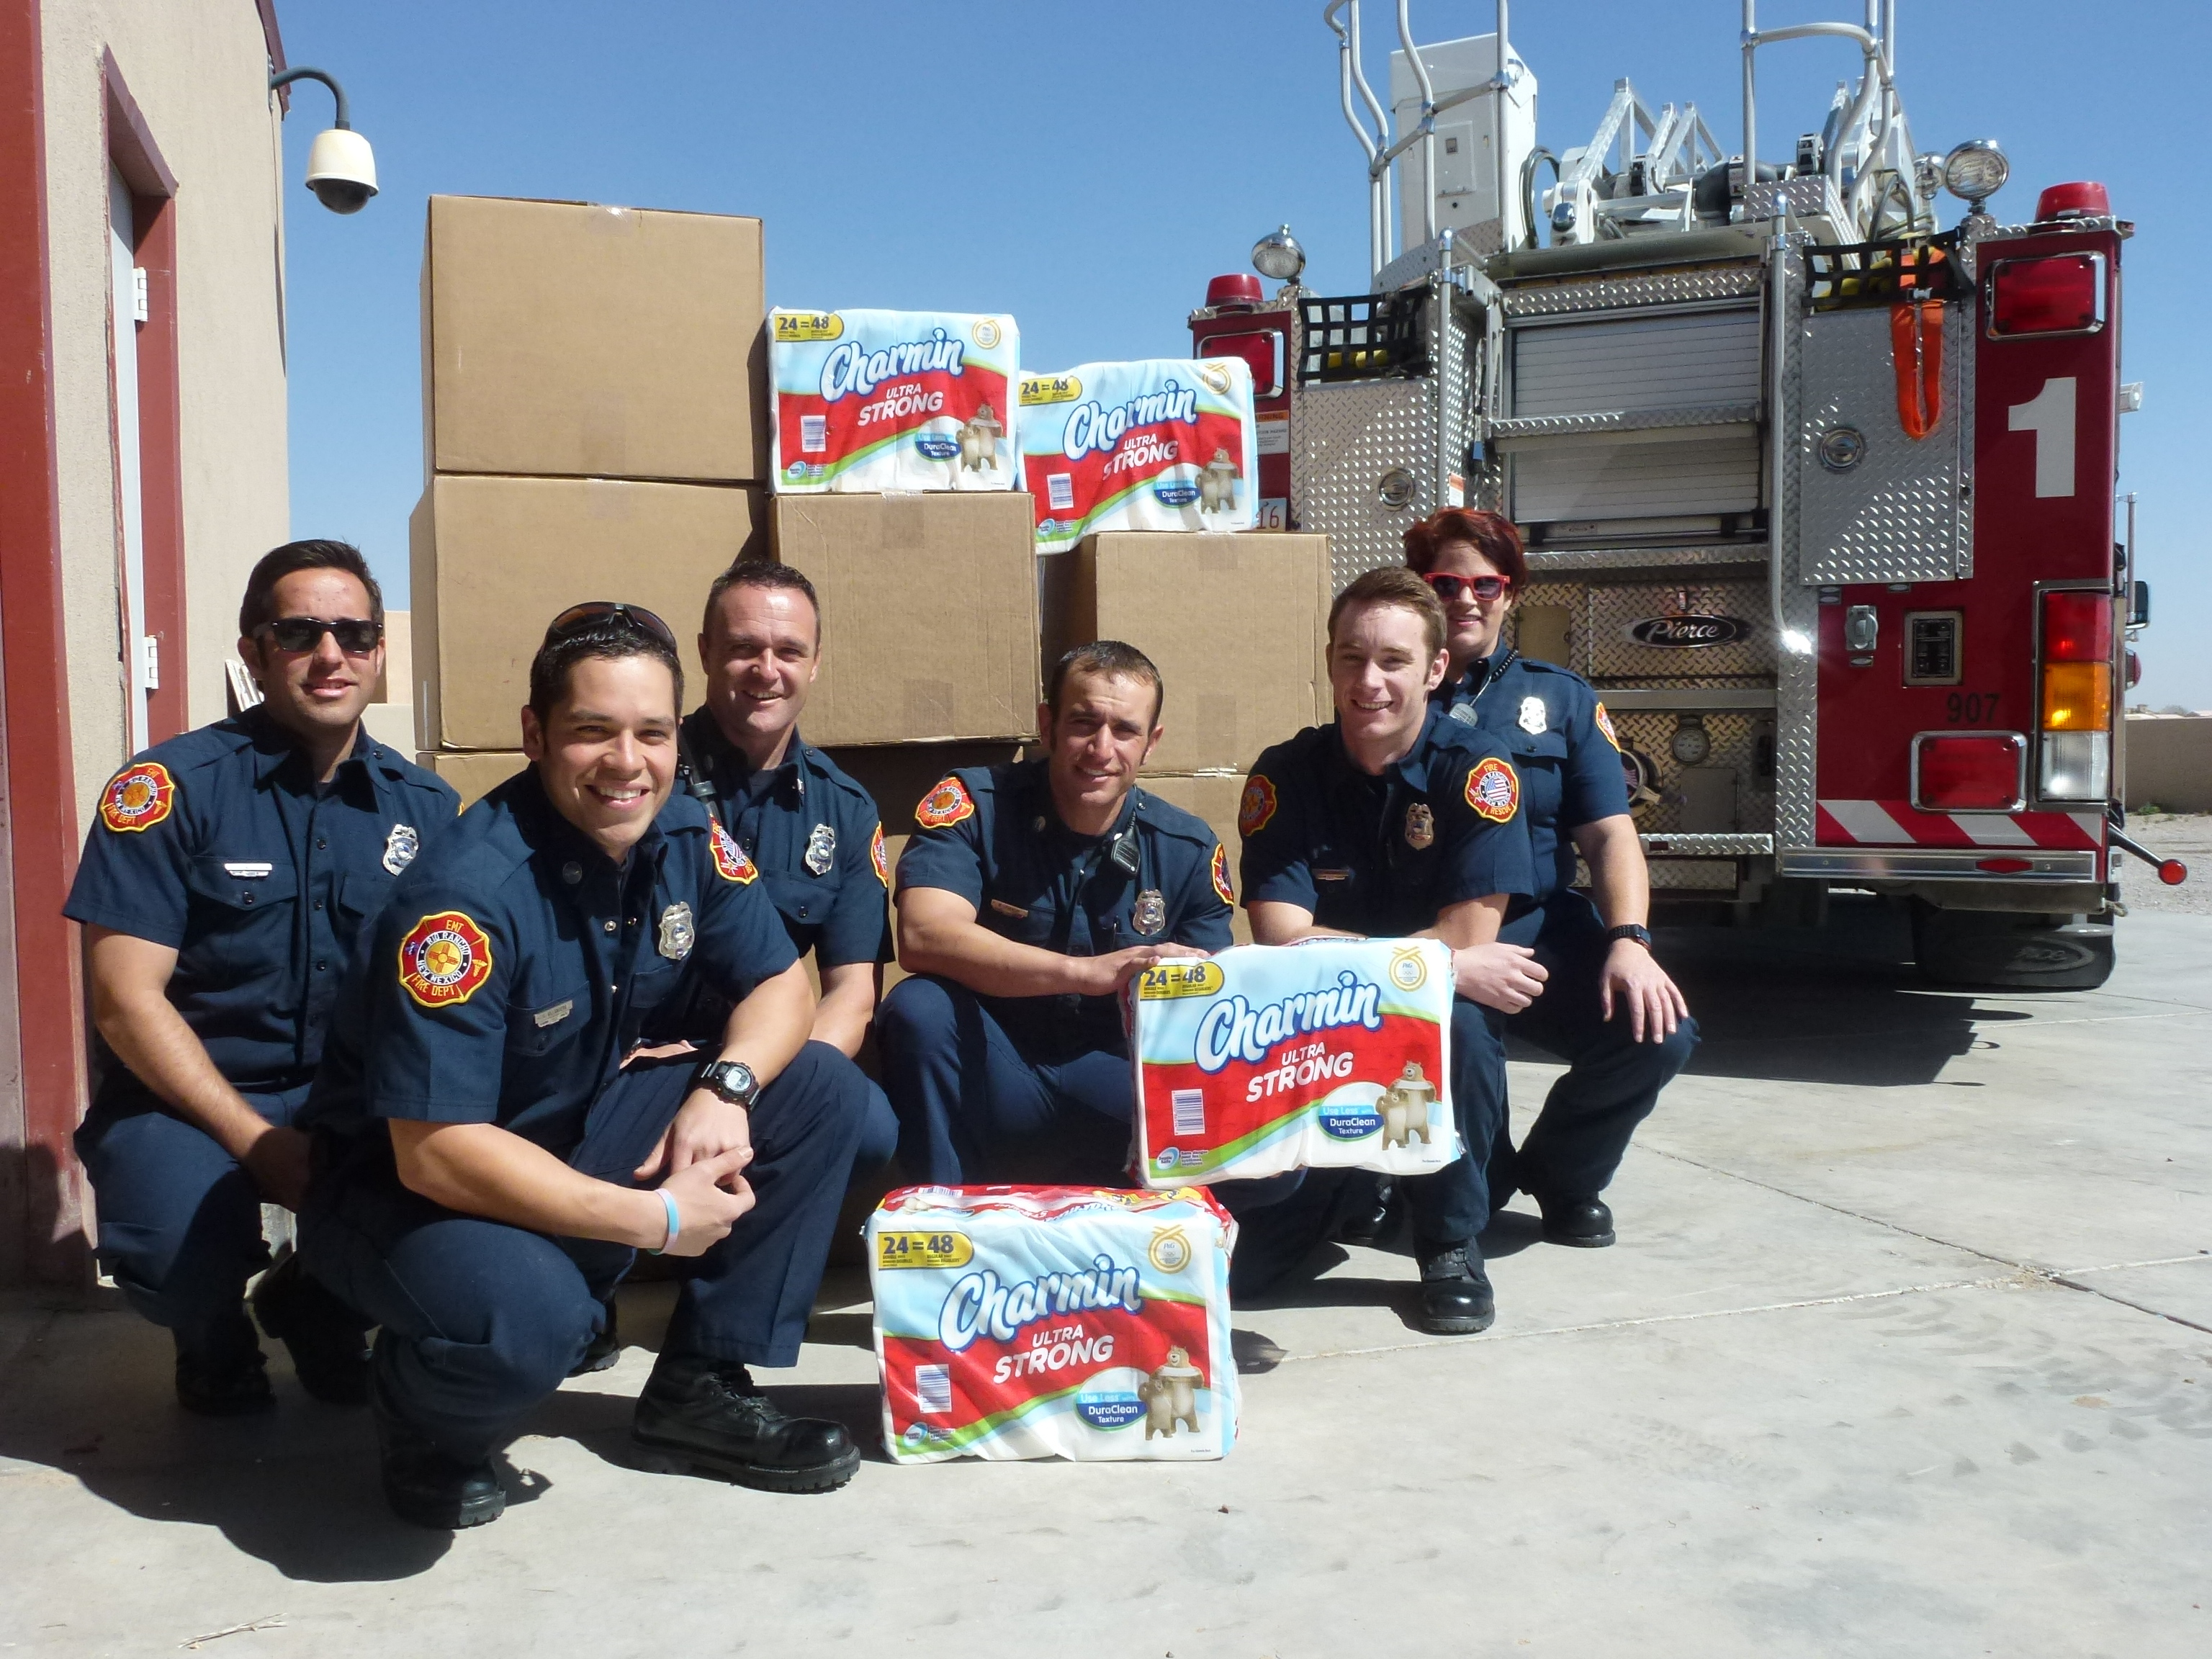 Photo Of Rio Rancho Fire Department Receiving A Donation